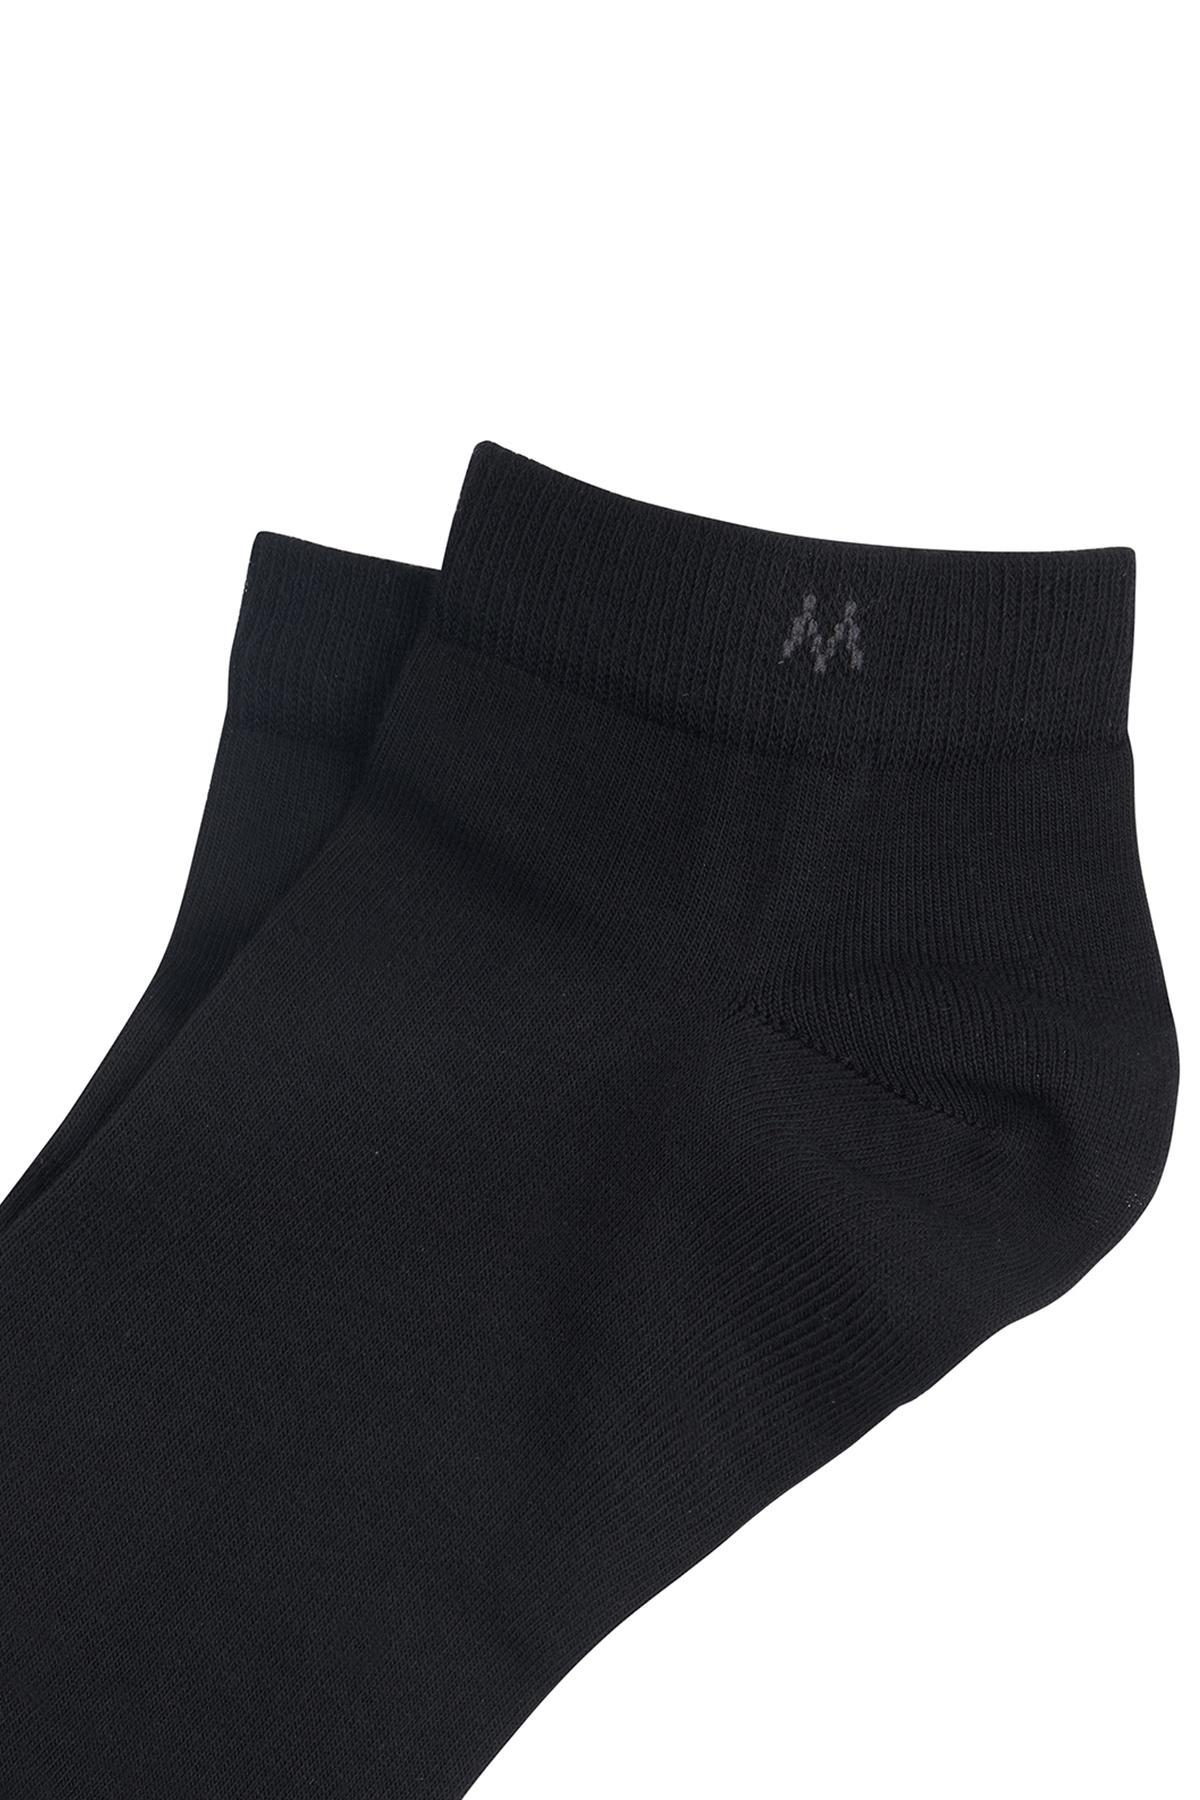 Pamuklu Siyah Kısa Sneaker Çorabı